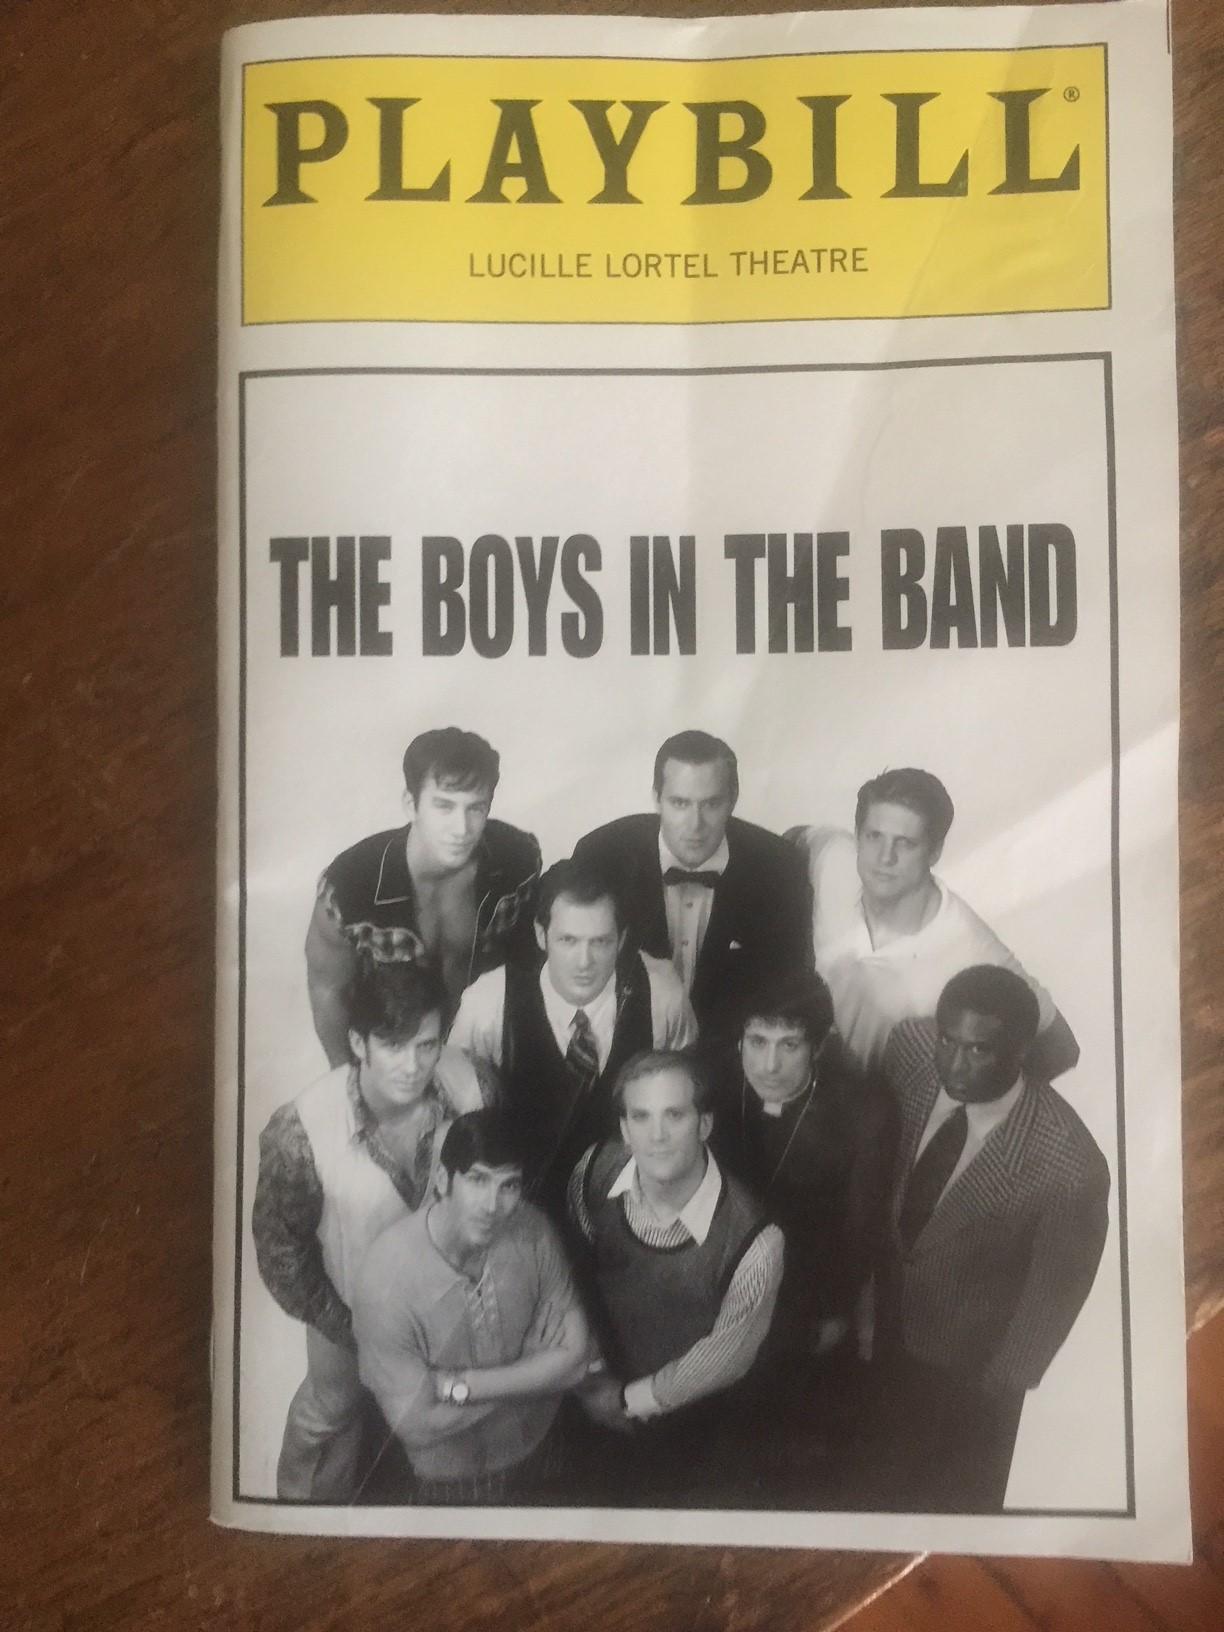 1996, off-Broadway